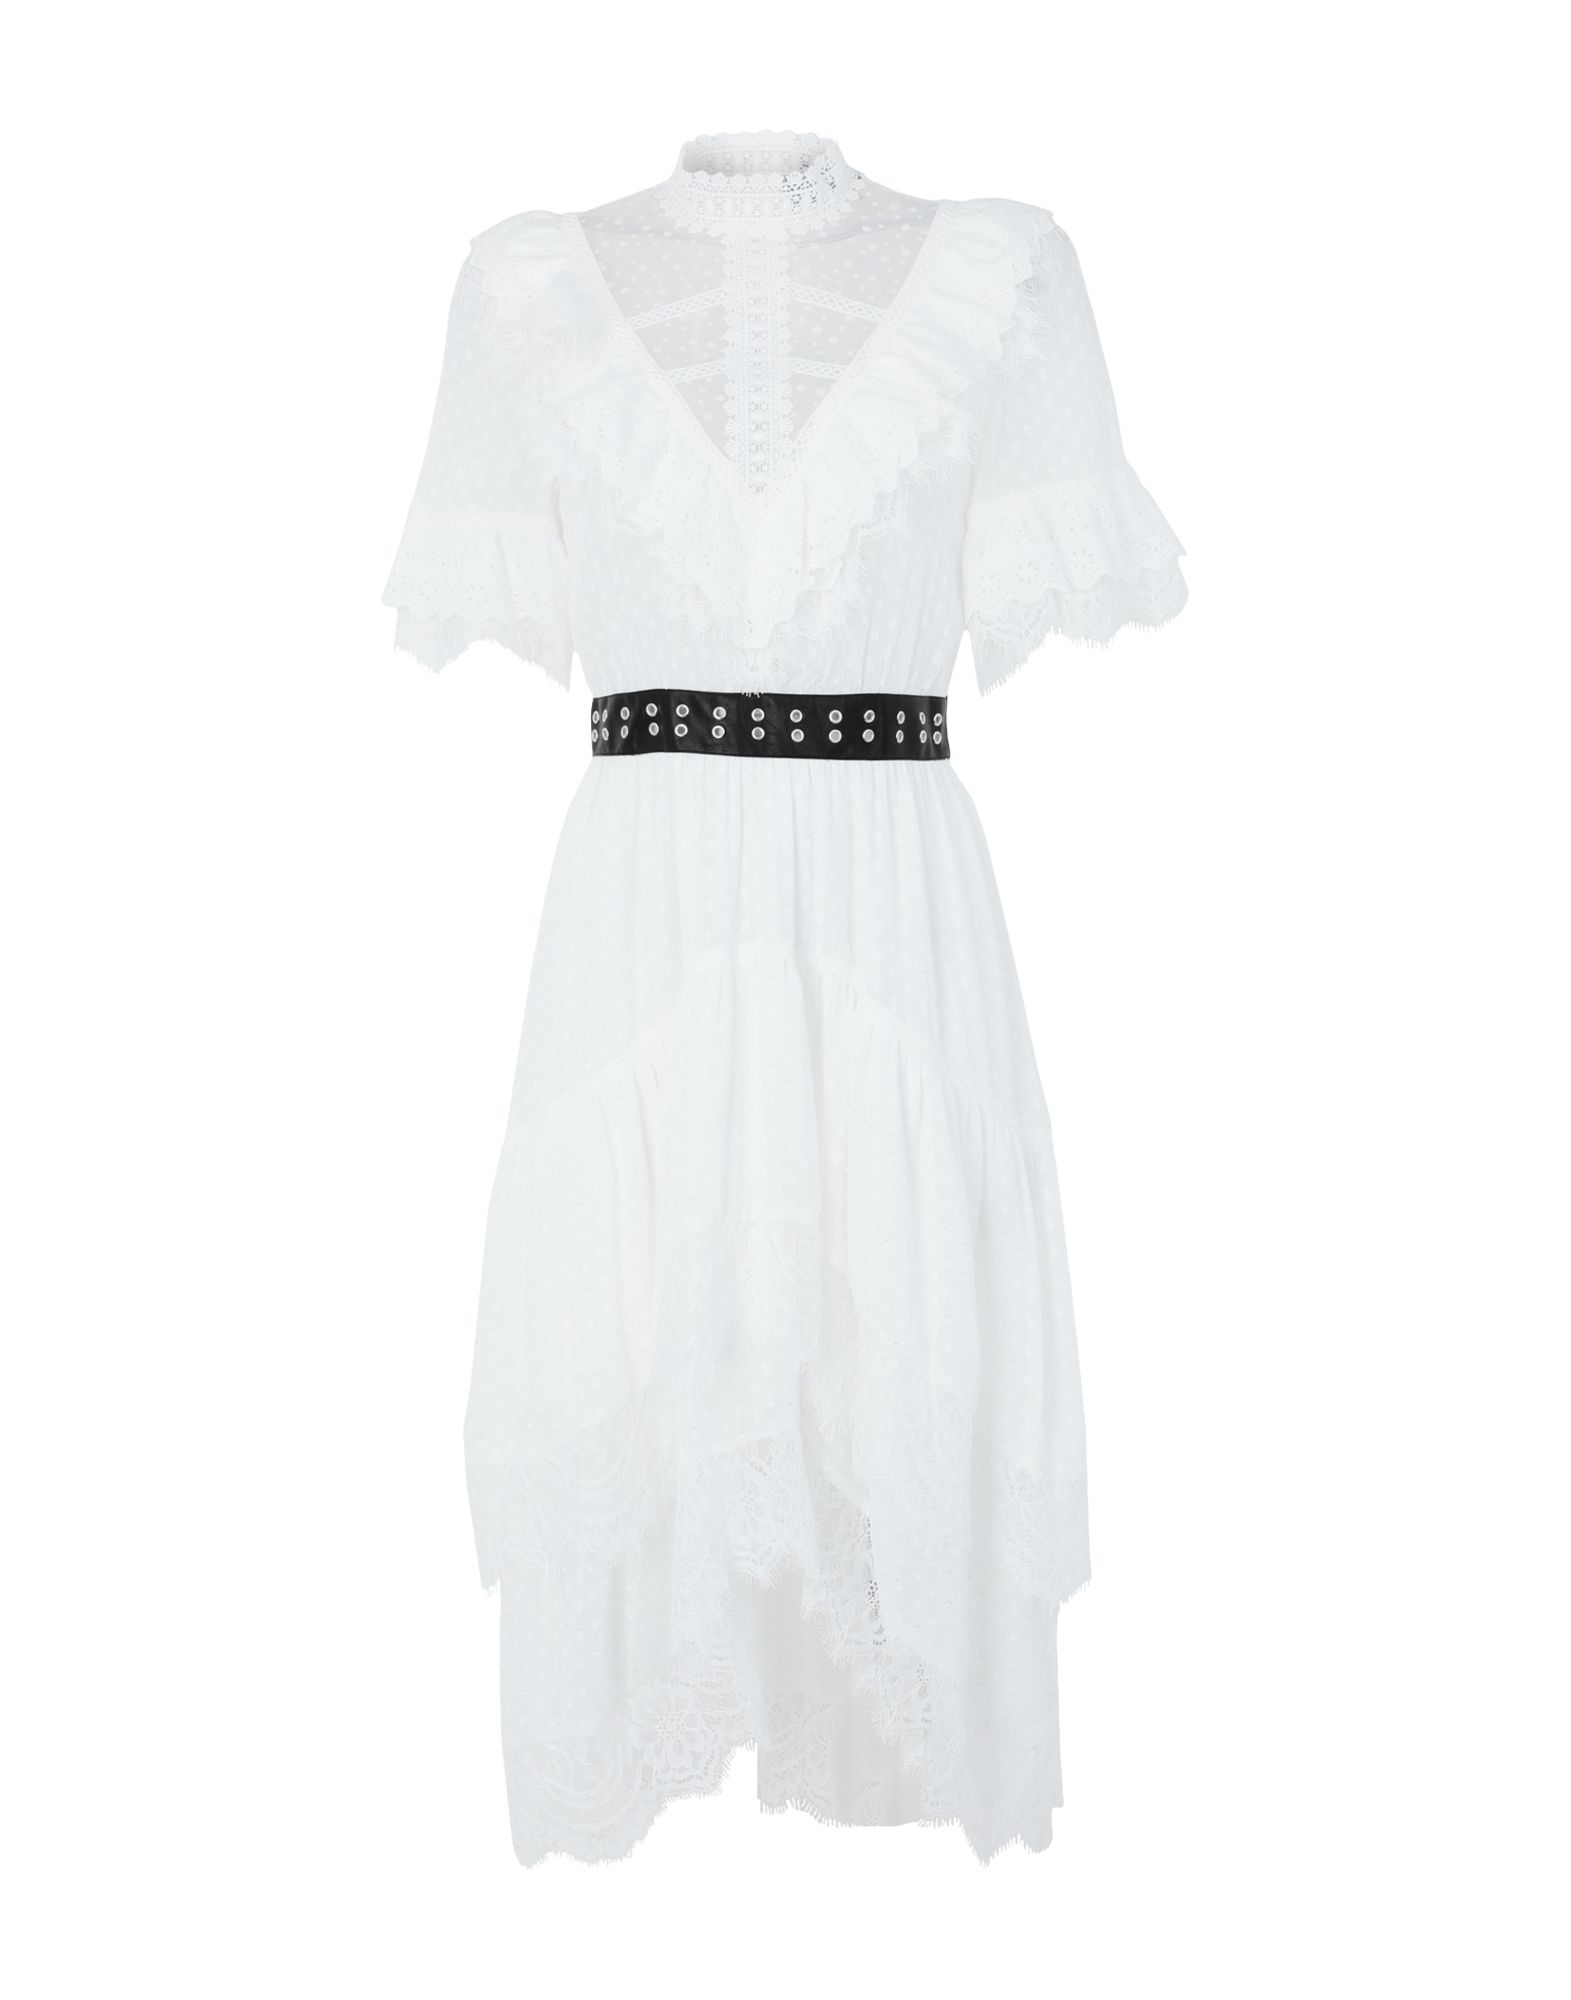 THE KOOPLES Платье длиной 3/4